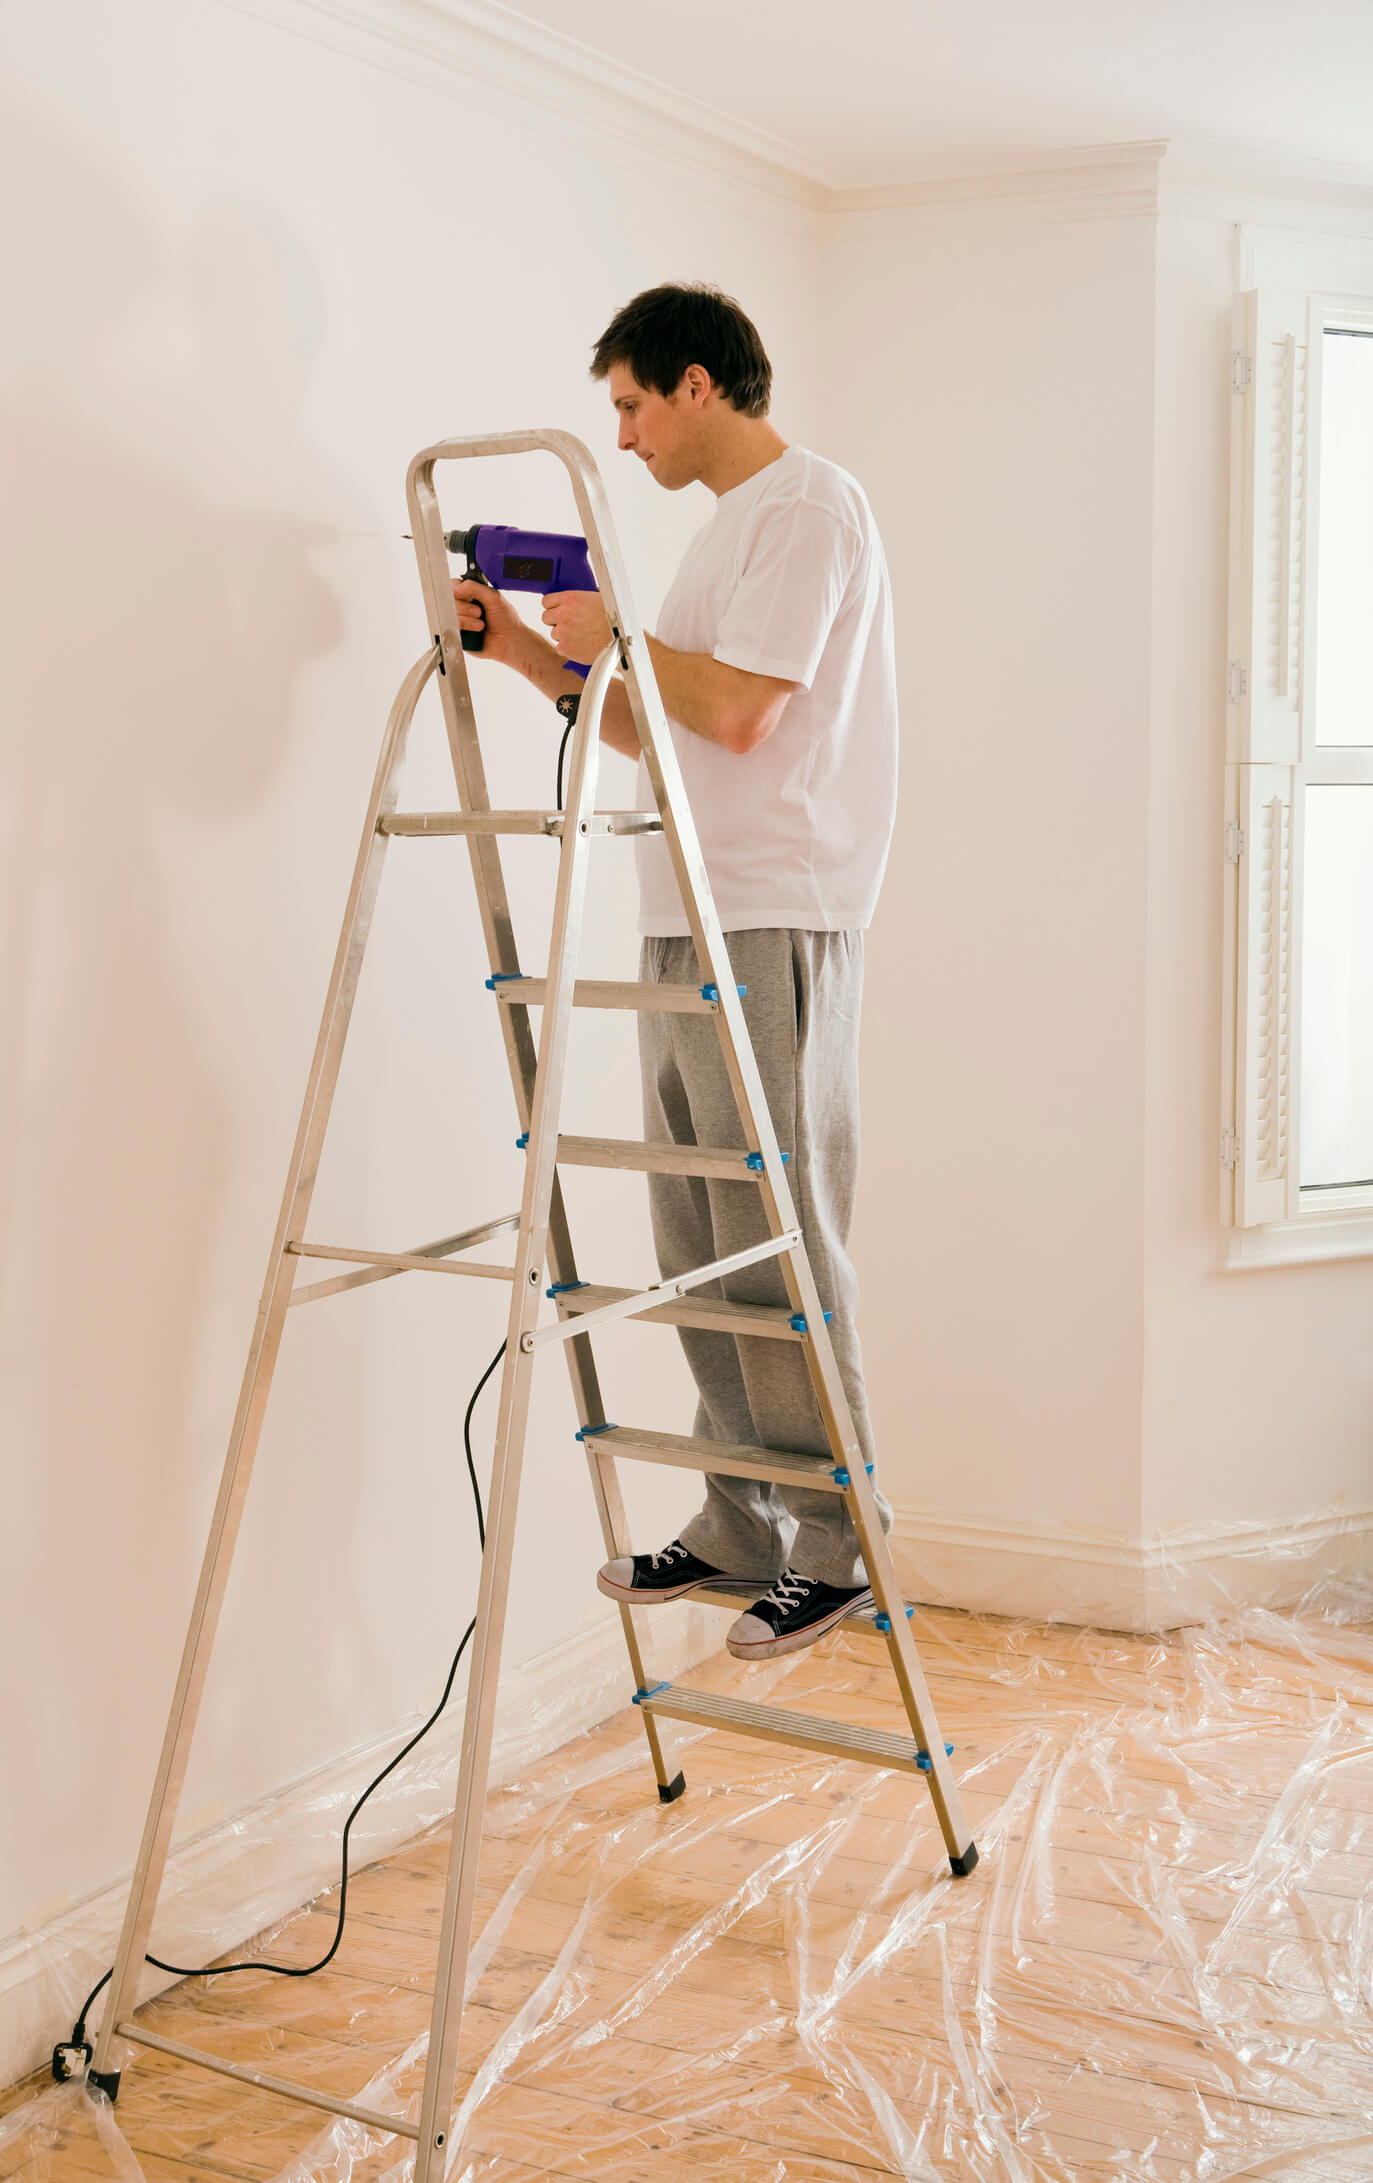 dons-handyman-services-llc